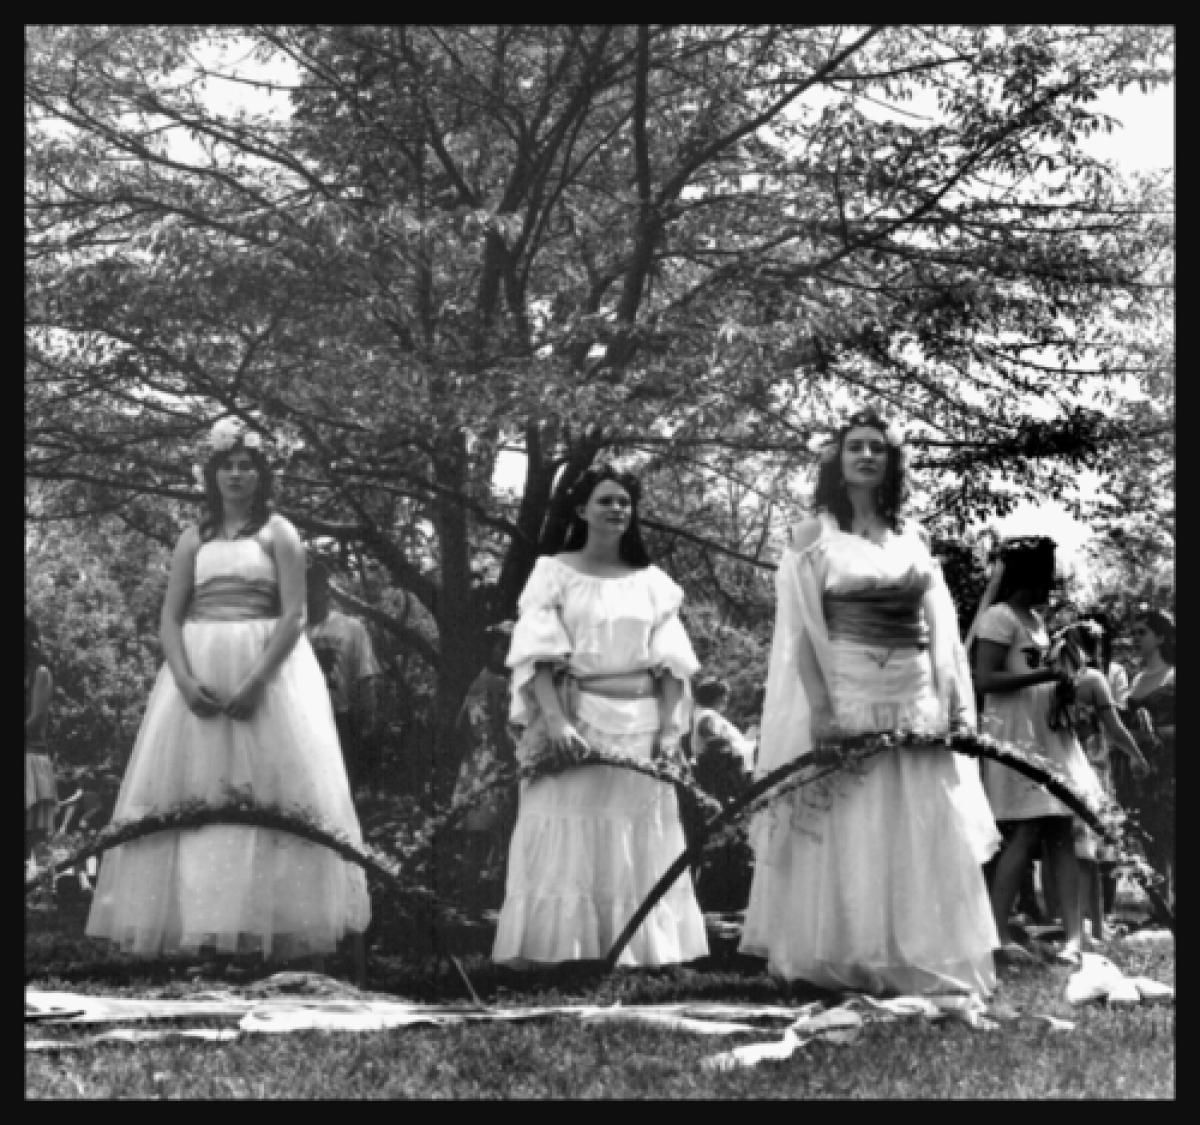 May Day Princesses, Shepherdstown, WV, 2010 (large view)